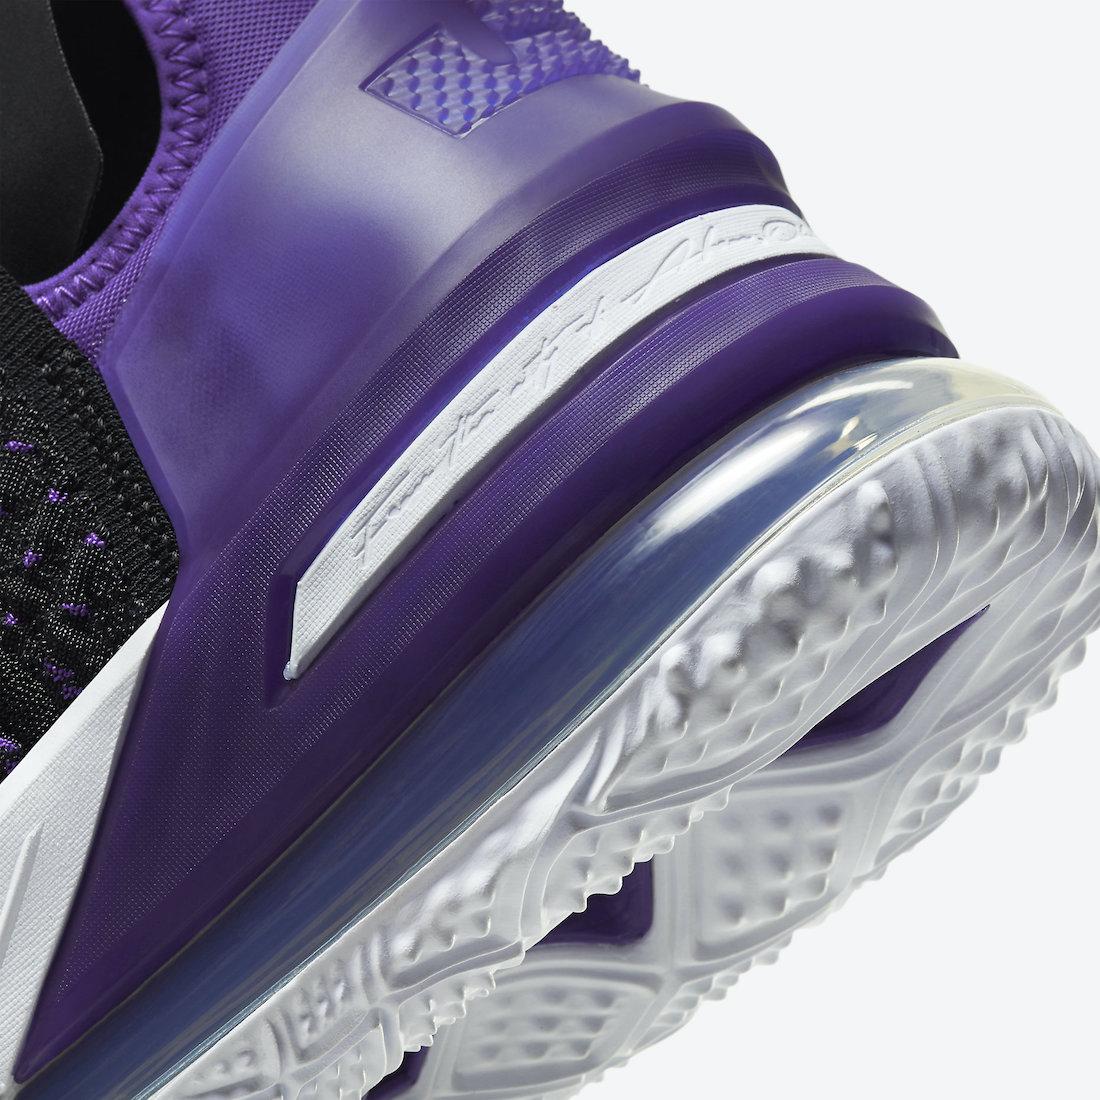 Nike-LeBron-18-Lakers-Court-Purple-CQ9283-004-Release-Date-7